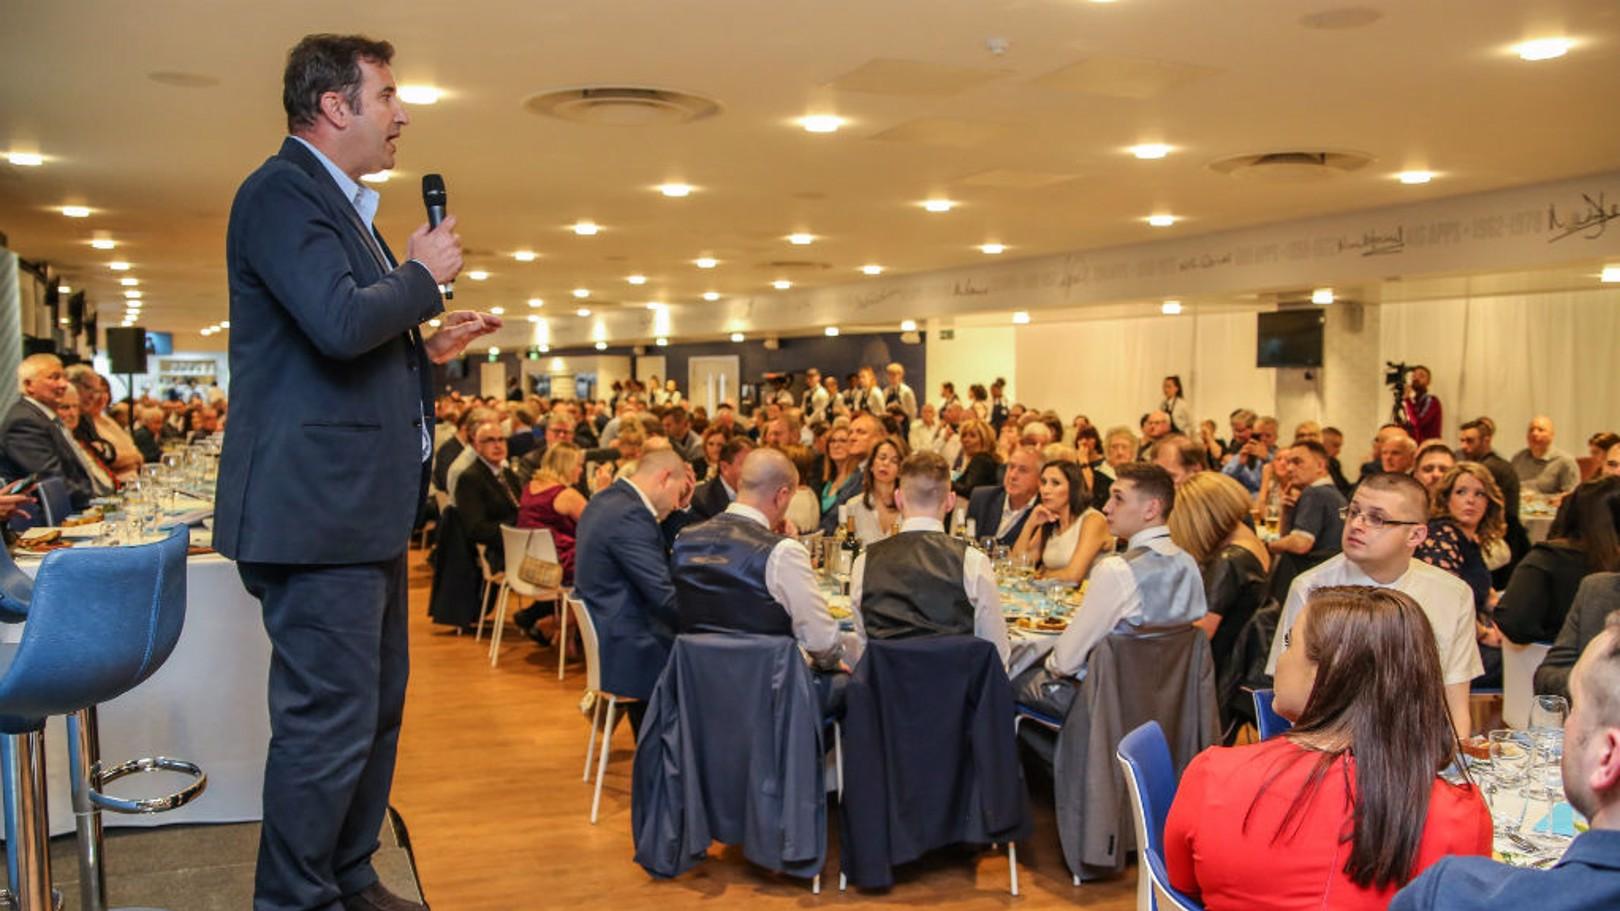 CEO Ferran Soriano talks at the dinner